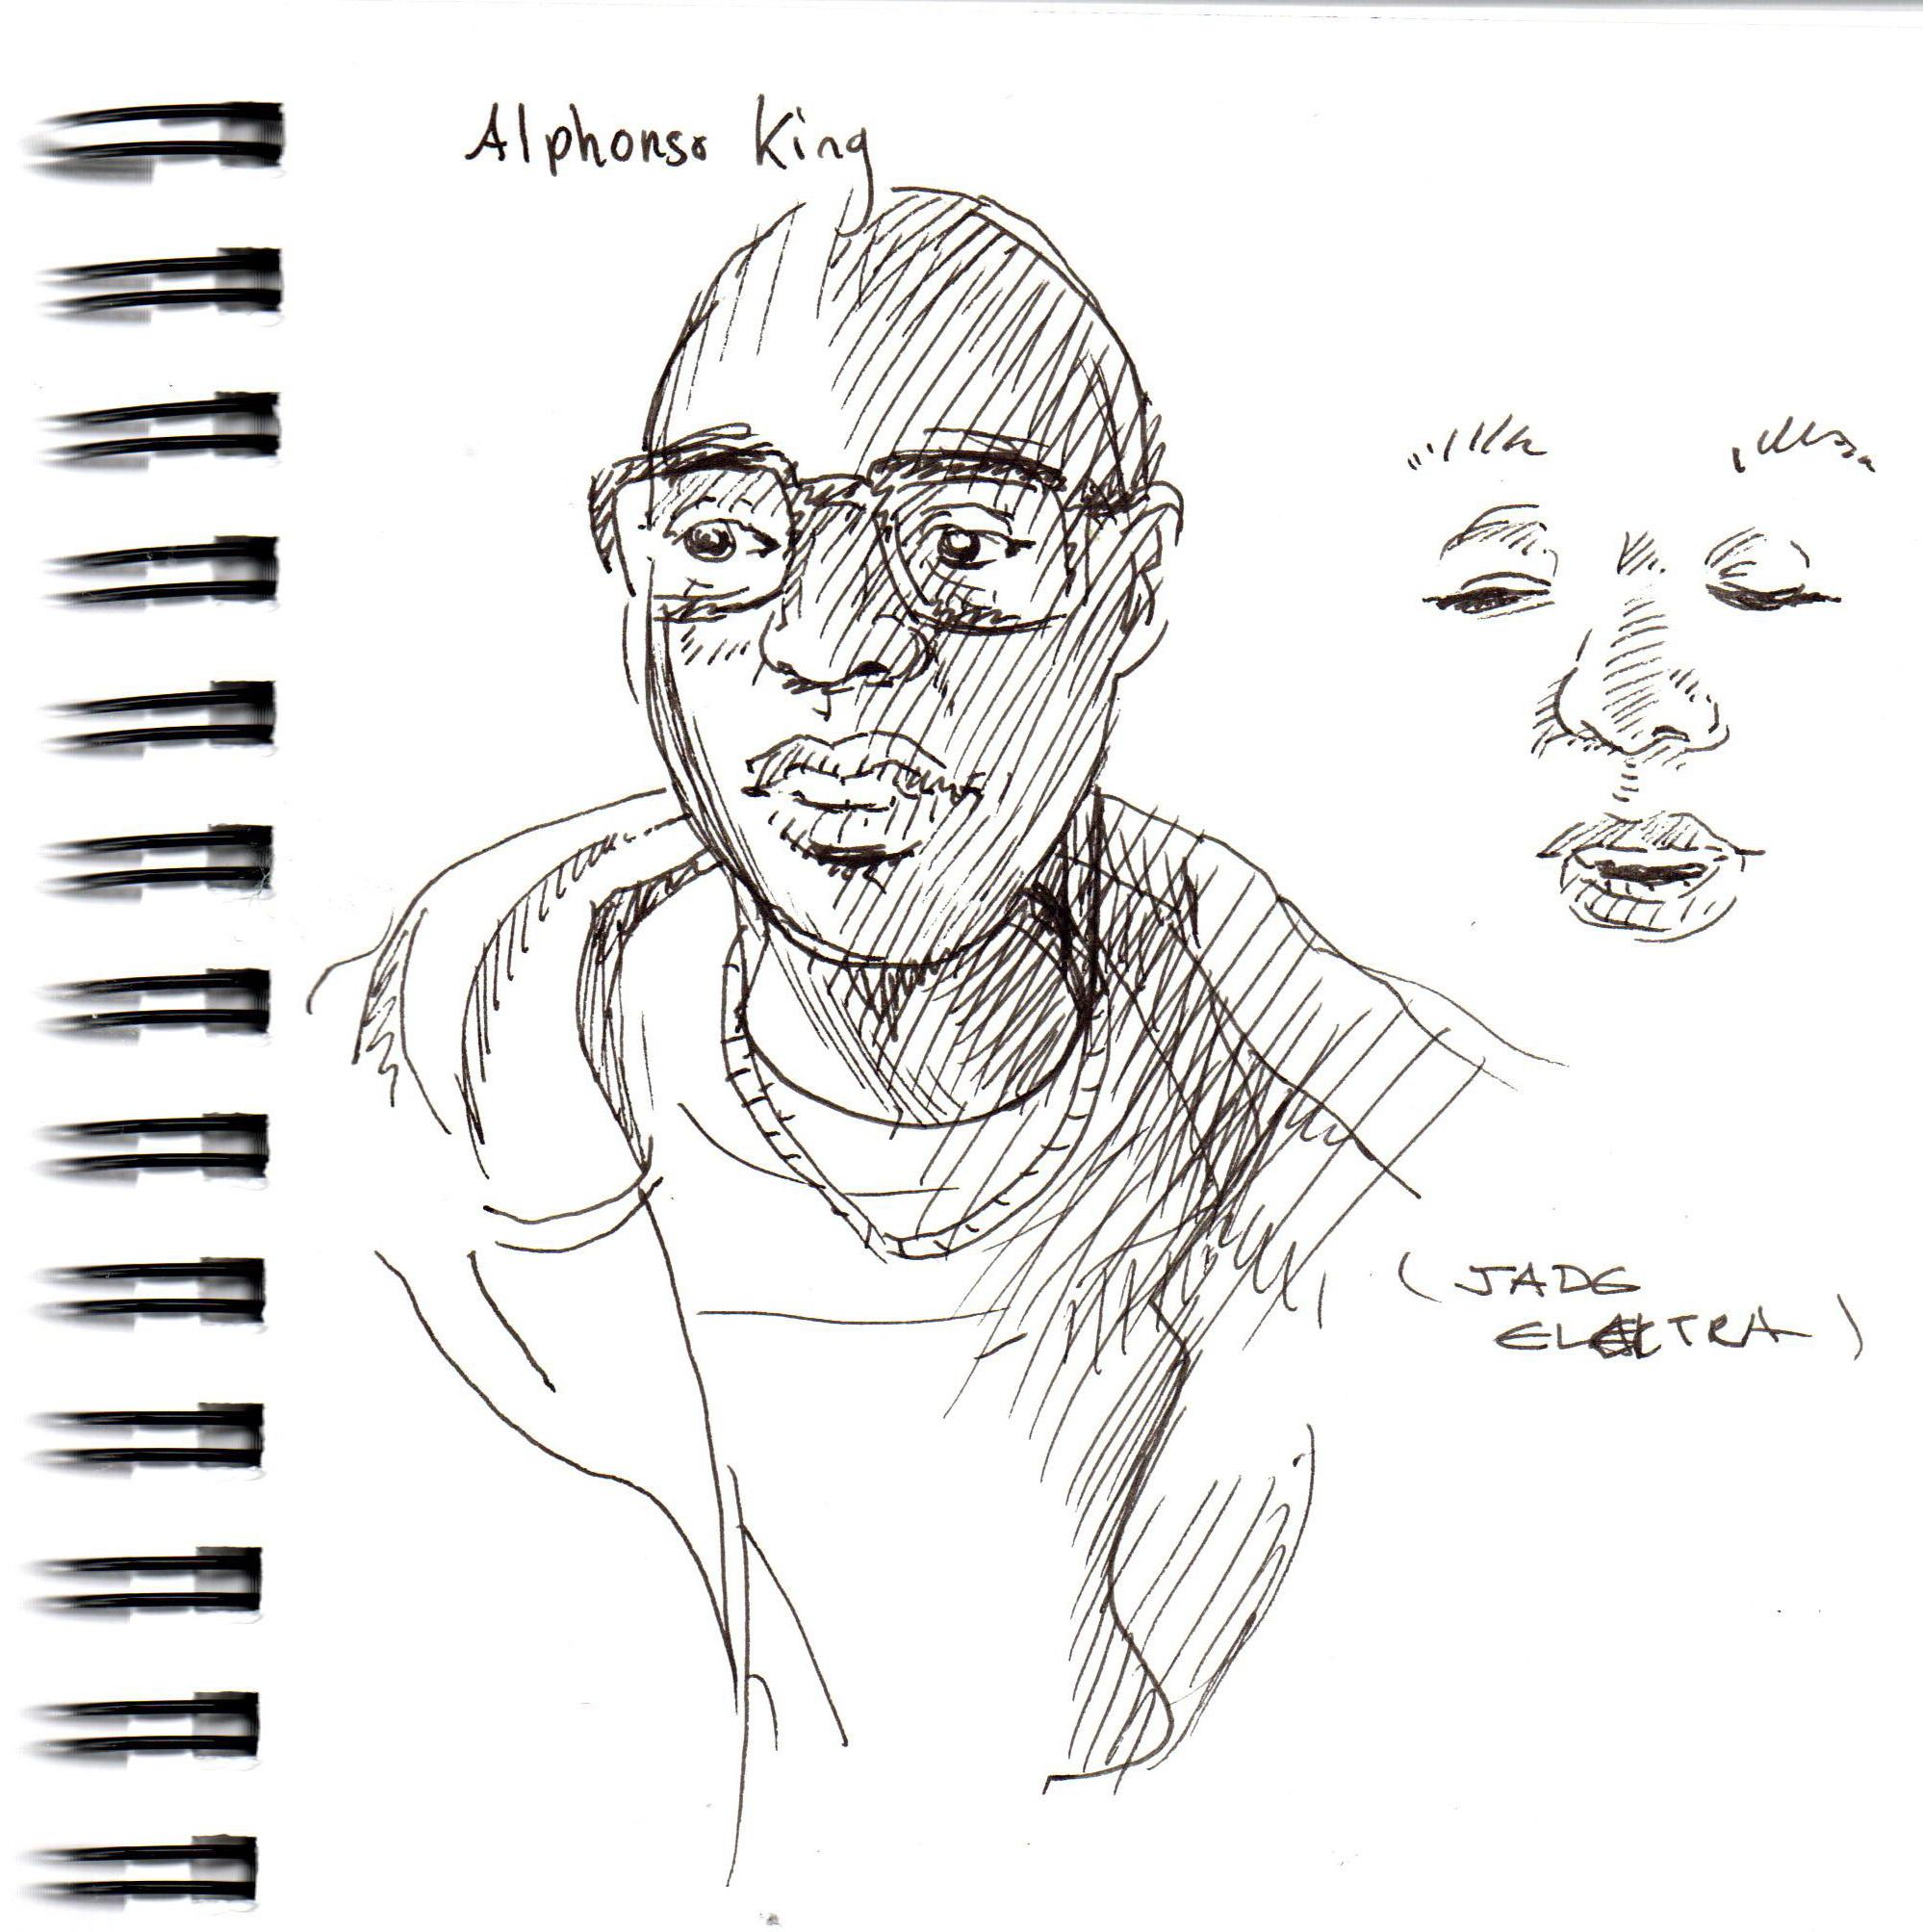 Alphonso King